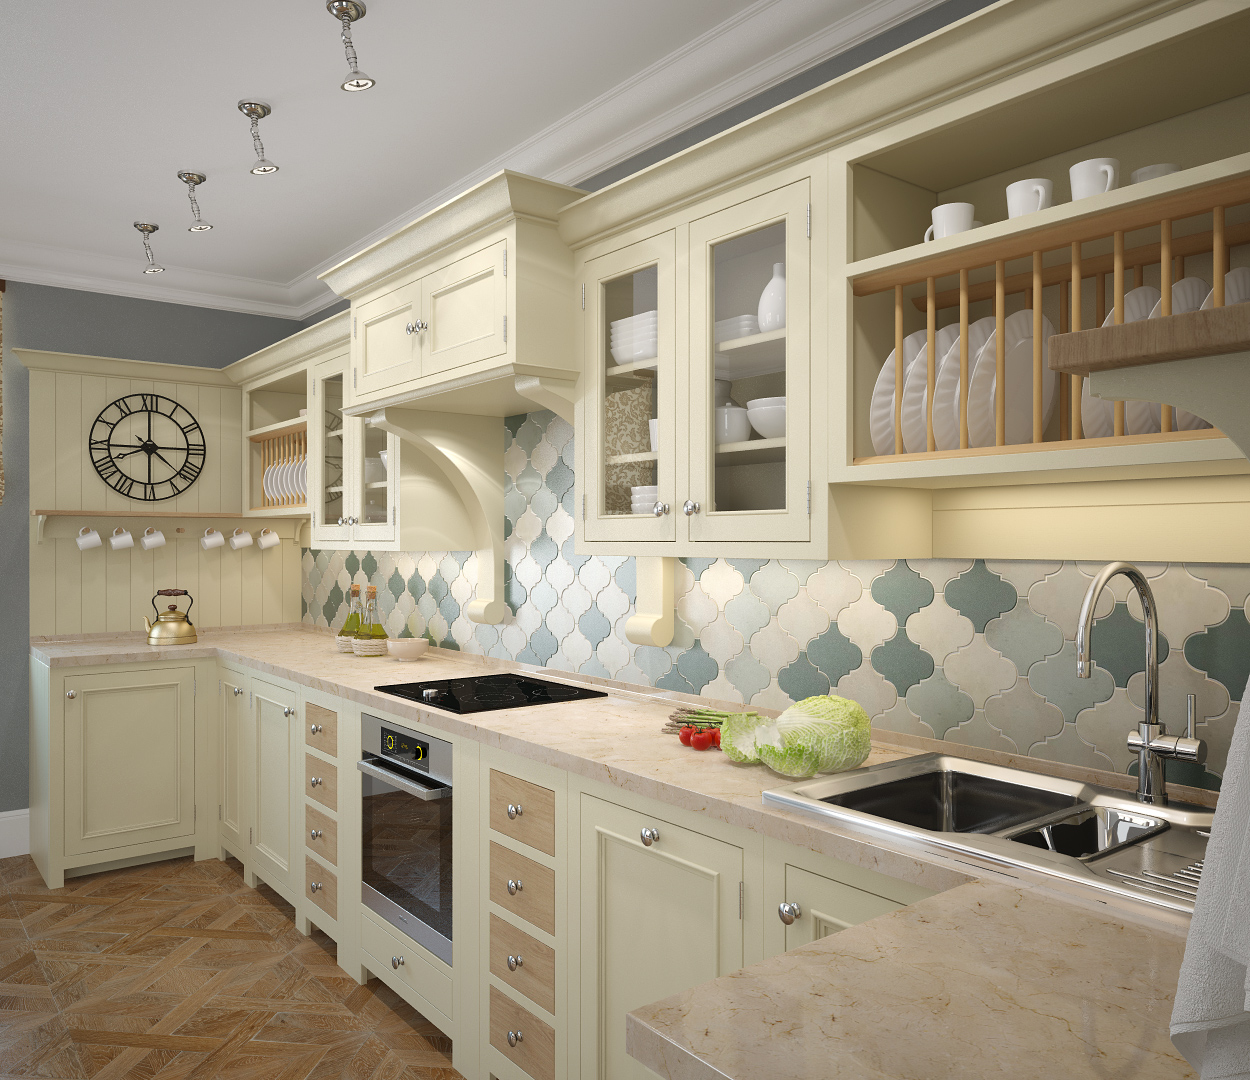 _SSCH2014_05_01_kitchen_k3_VRayPhysicalCamera002